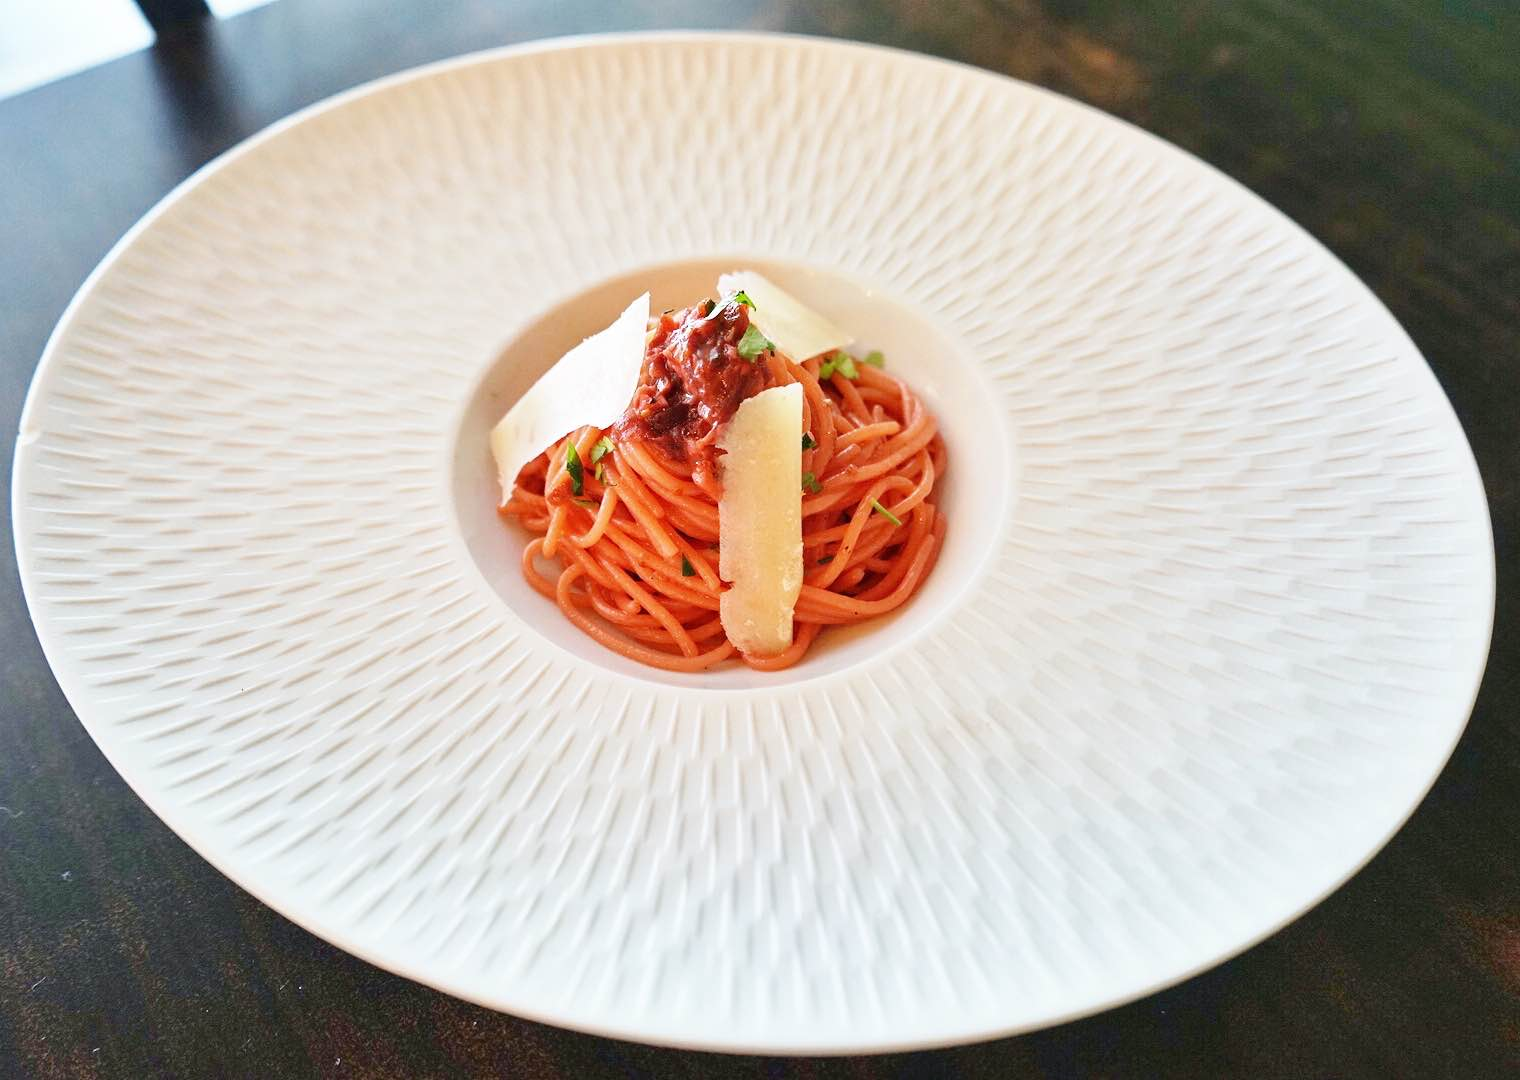 Barbabietola Rossa Pasta PocoLoco Singapore - AspirantSG